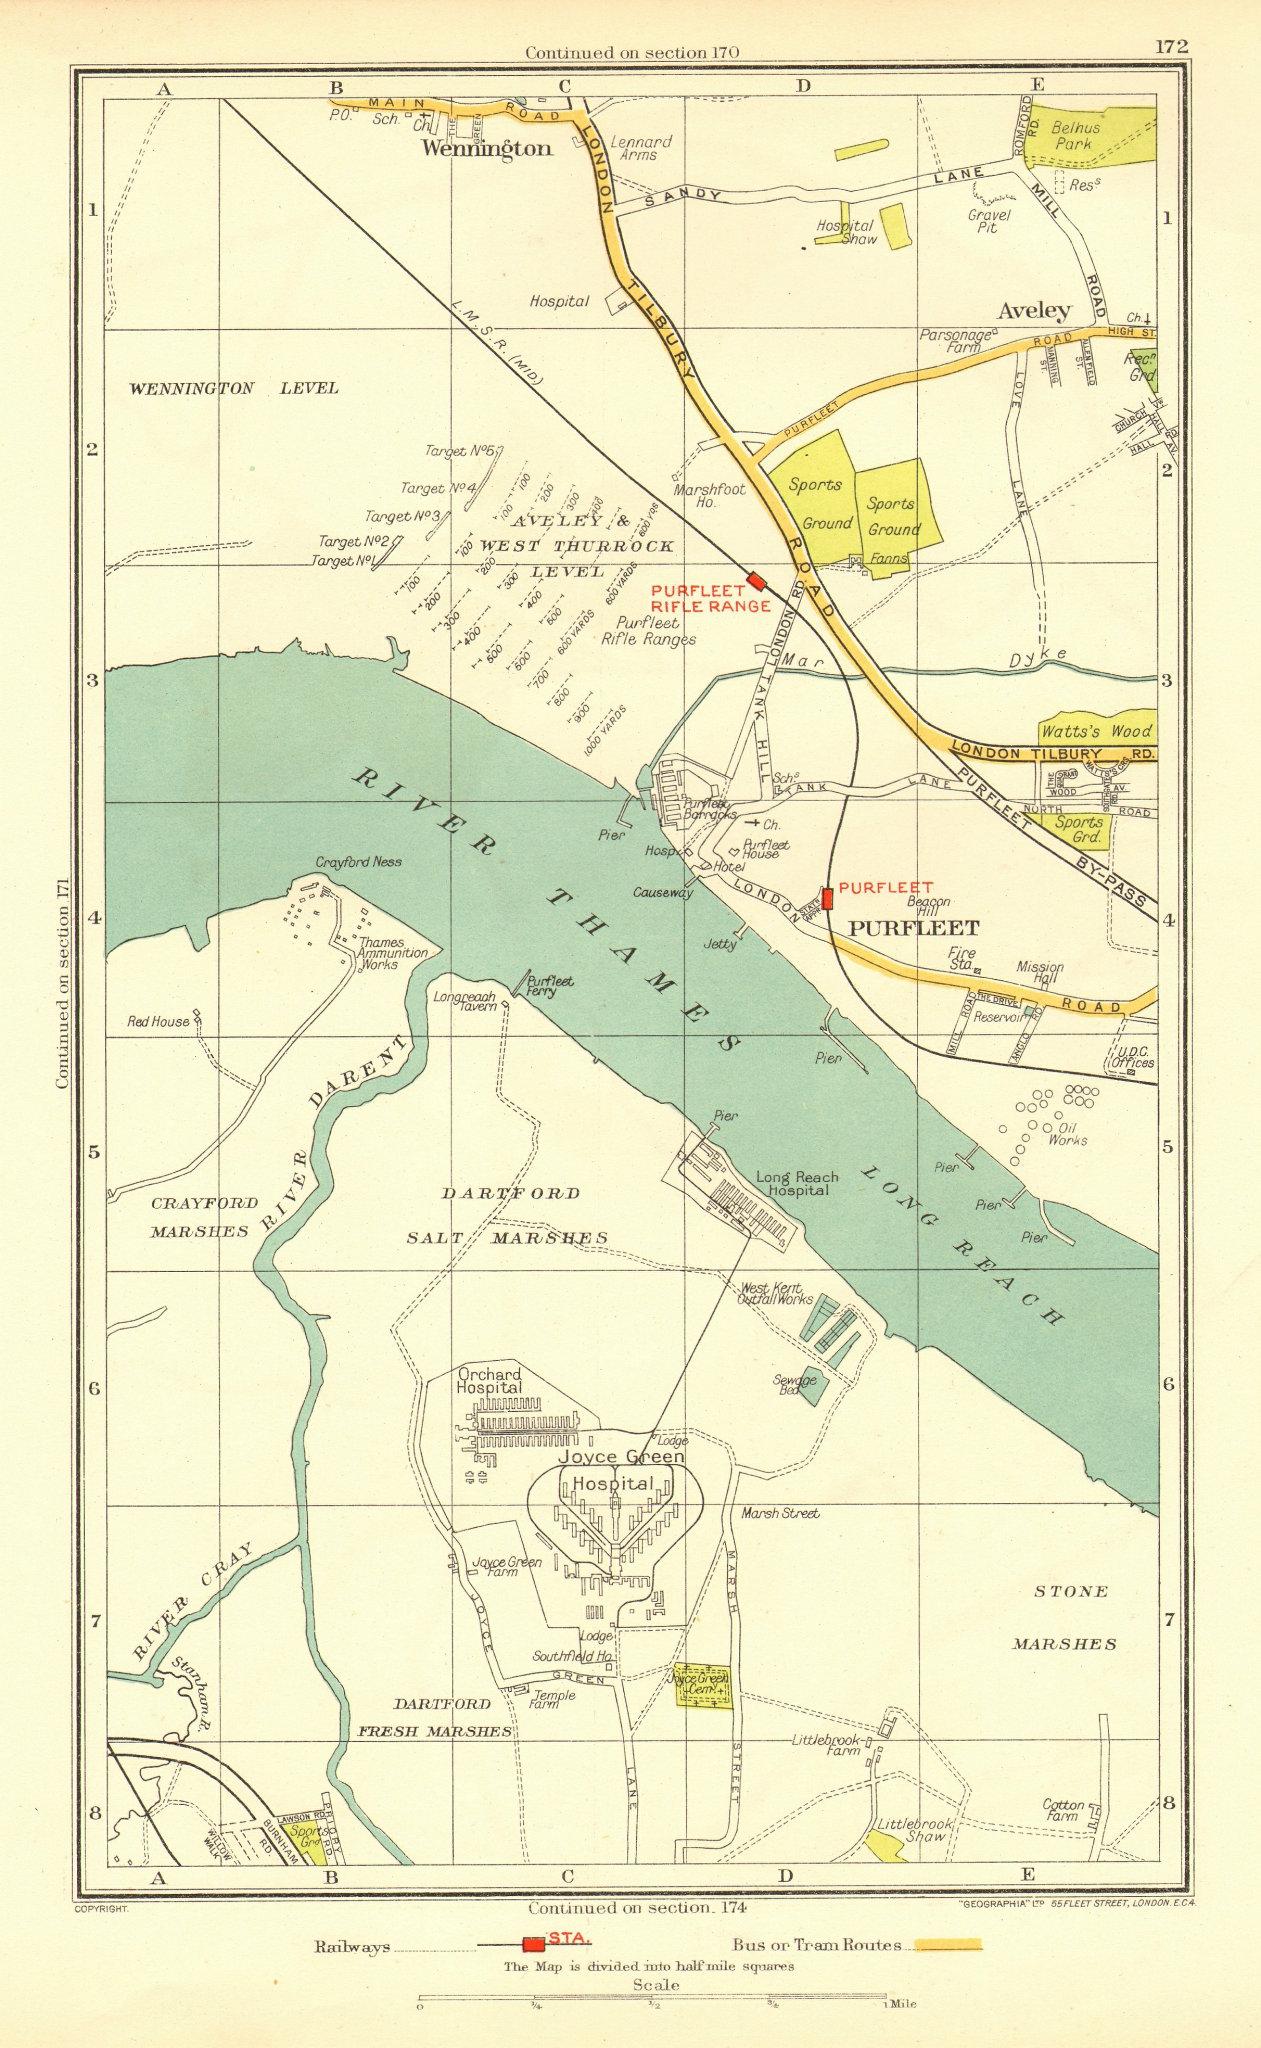 DARTFORD PURFLEET. Aveley Wennington Rainham Temple Hill (Essex/Kent) 1937 map